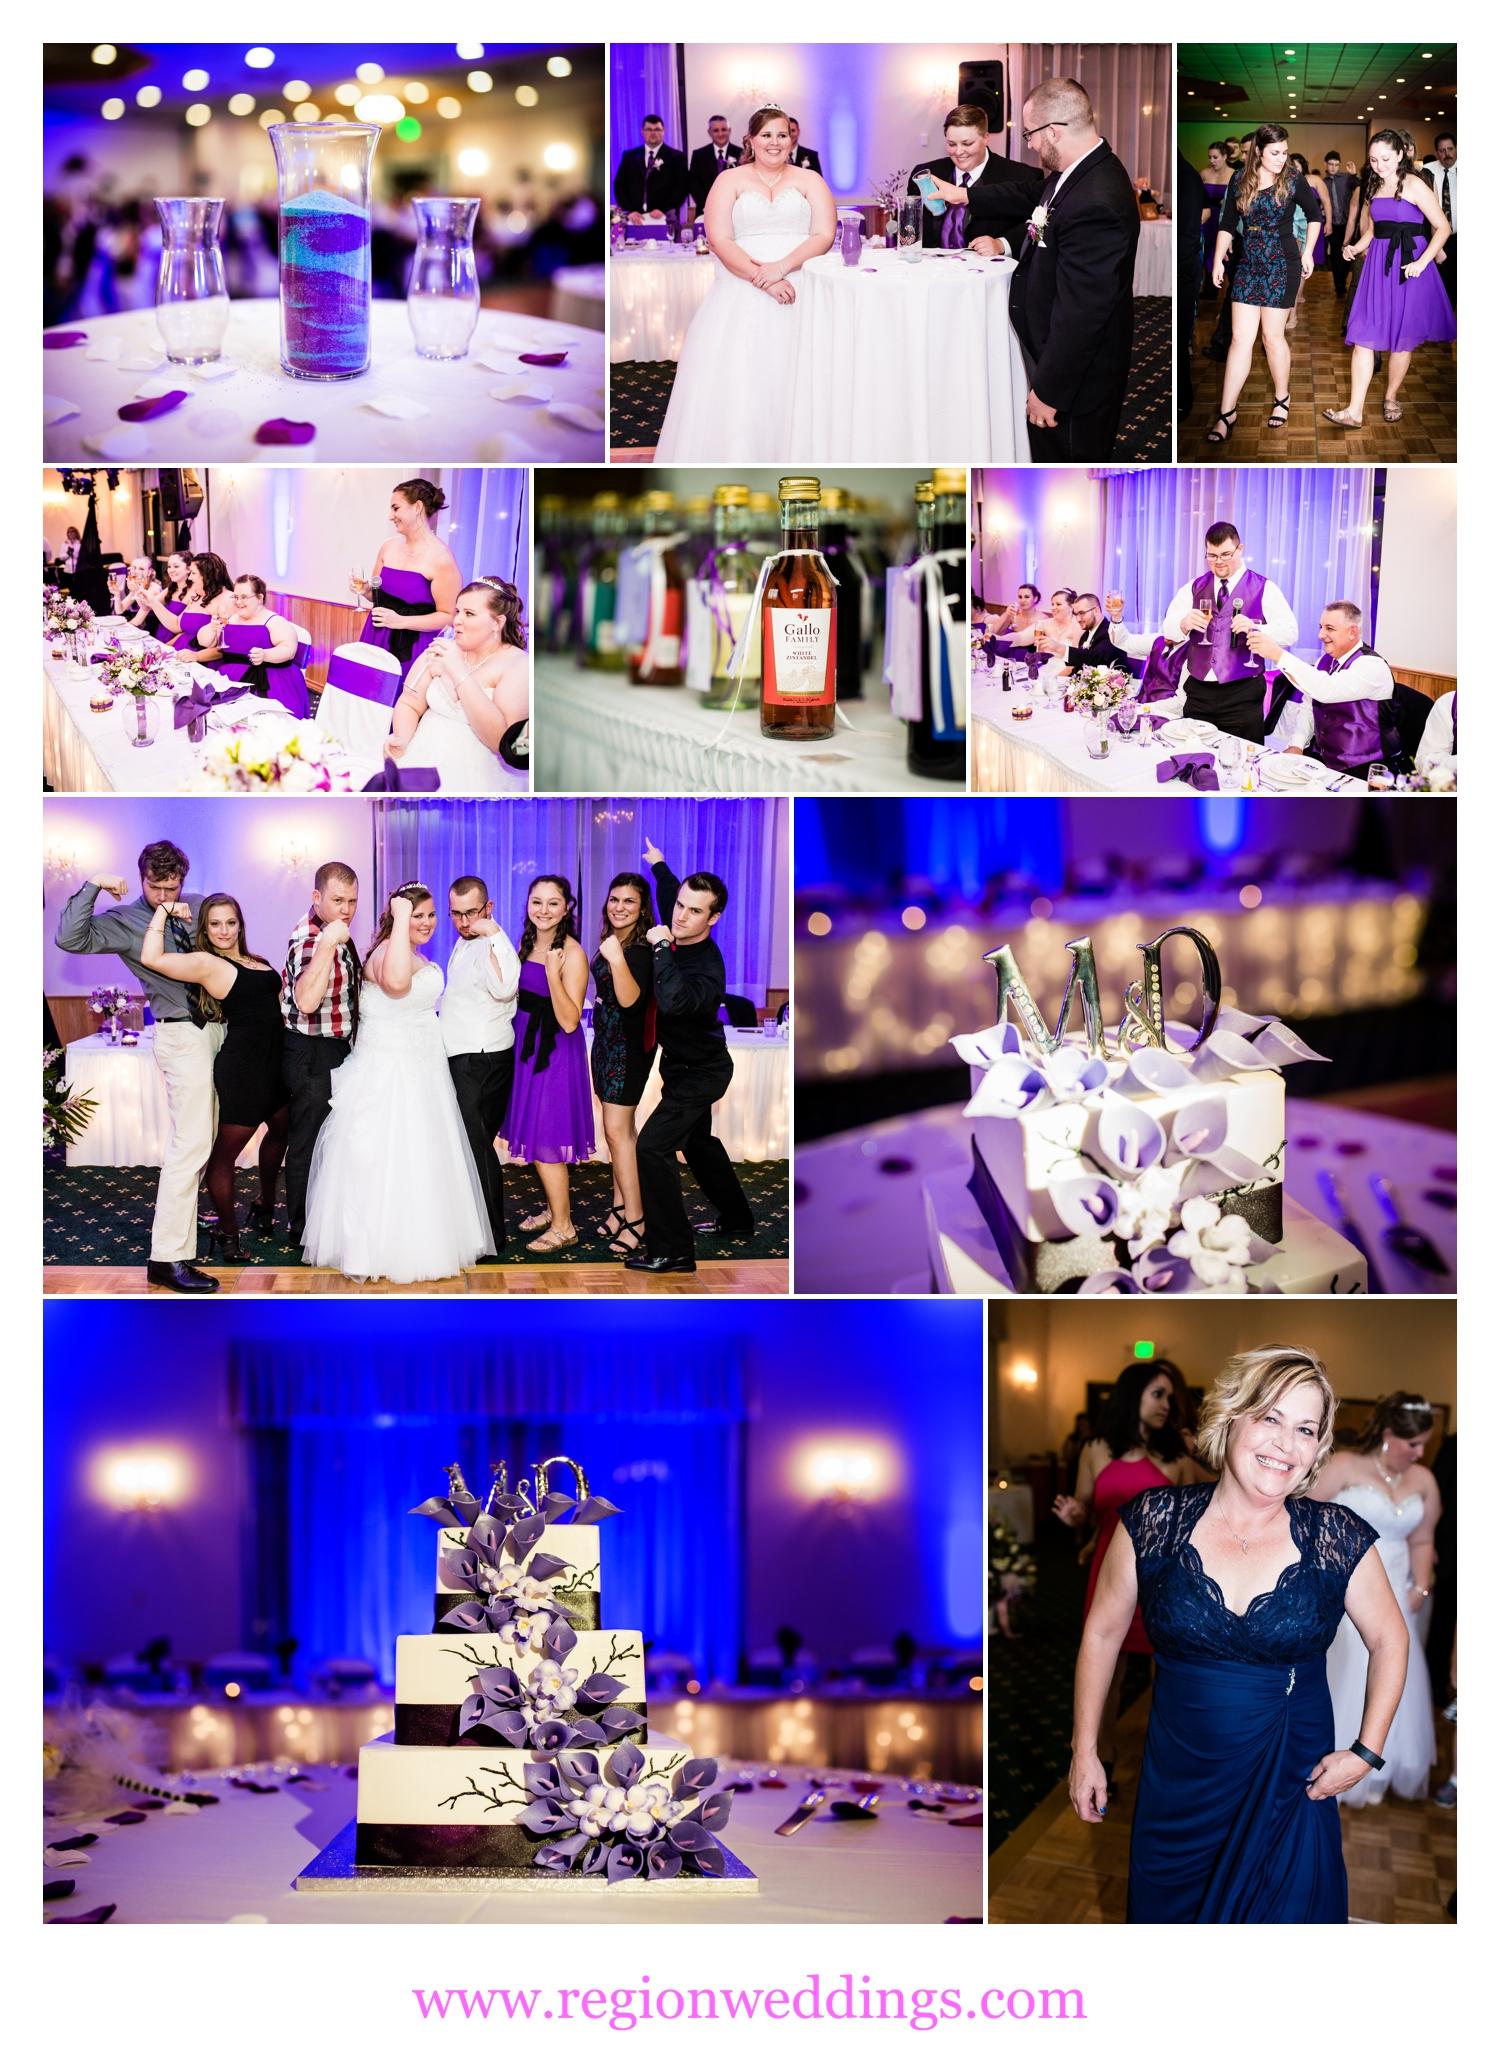 Wedding reception fun at The Patrician Banquets.